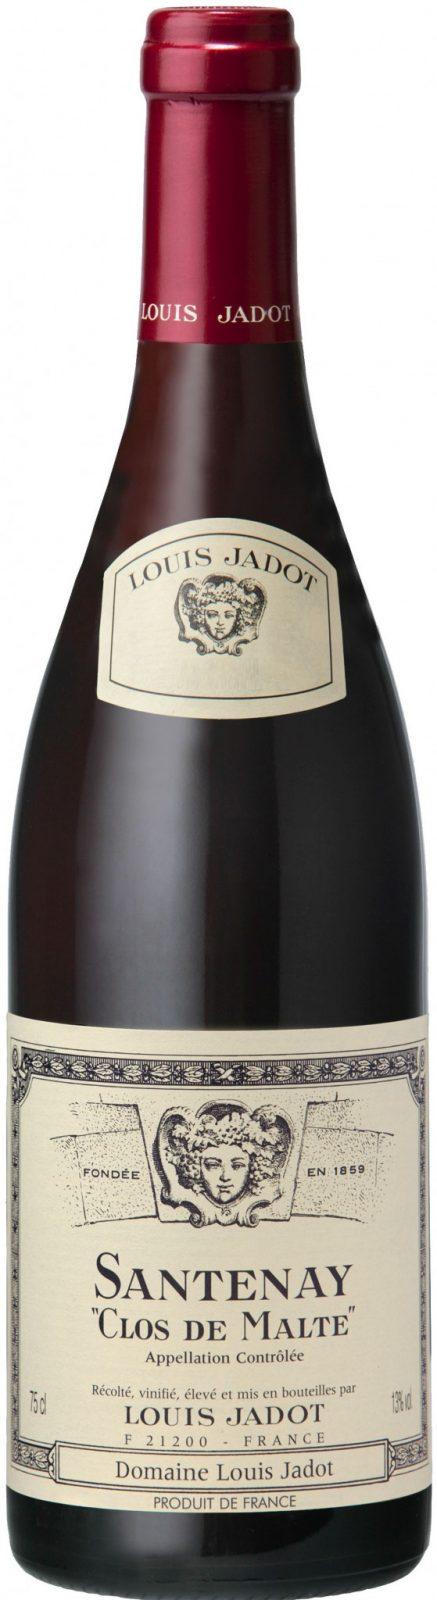 Louis Jadot Santenay Clos de Malte rouge WineAffair